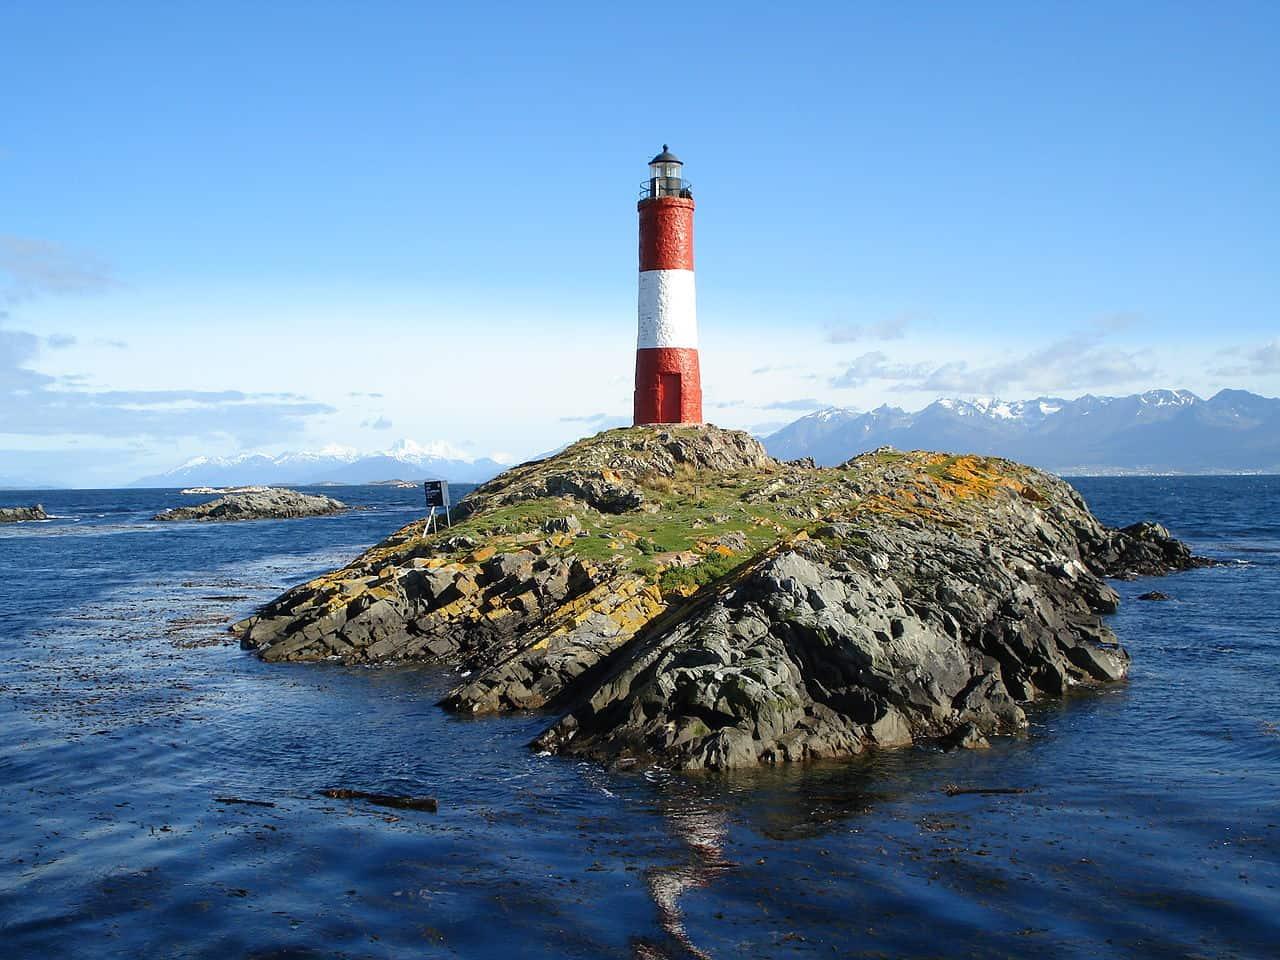 Les Eclaireurs Lighthouse, Tierra del Fuego, Argentina